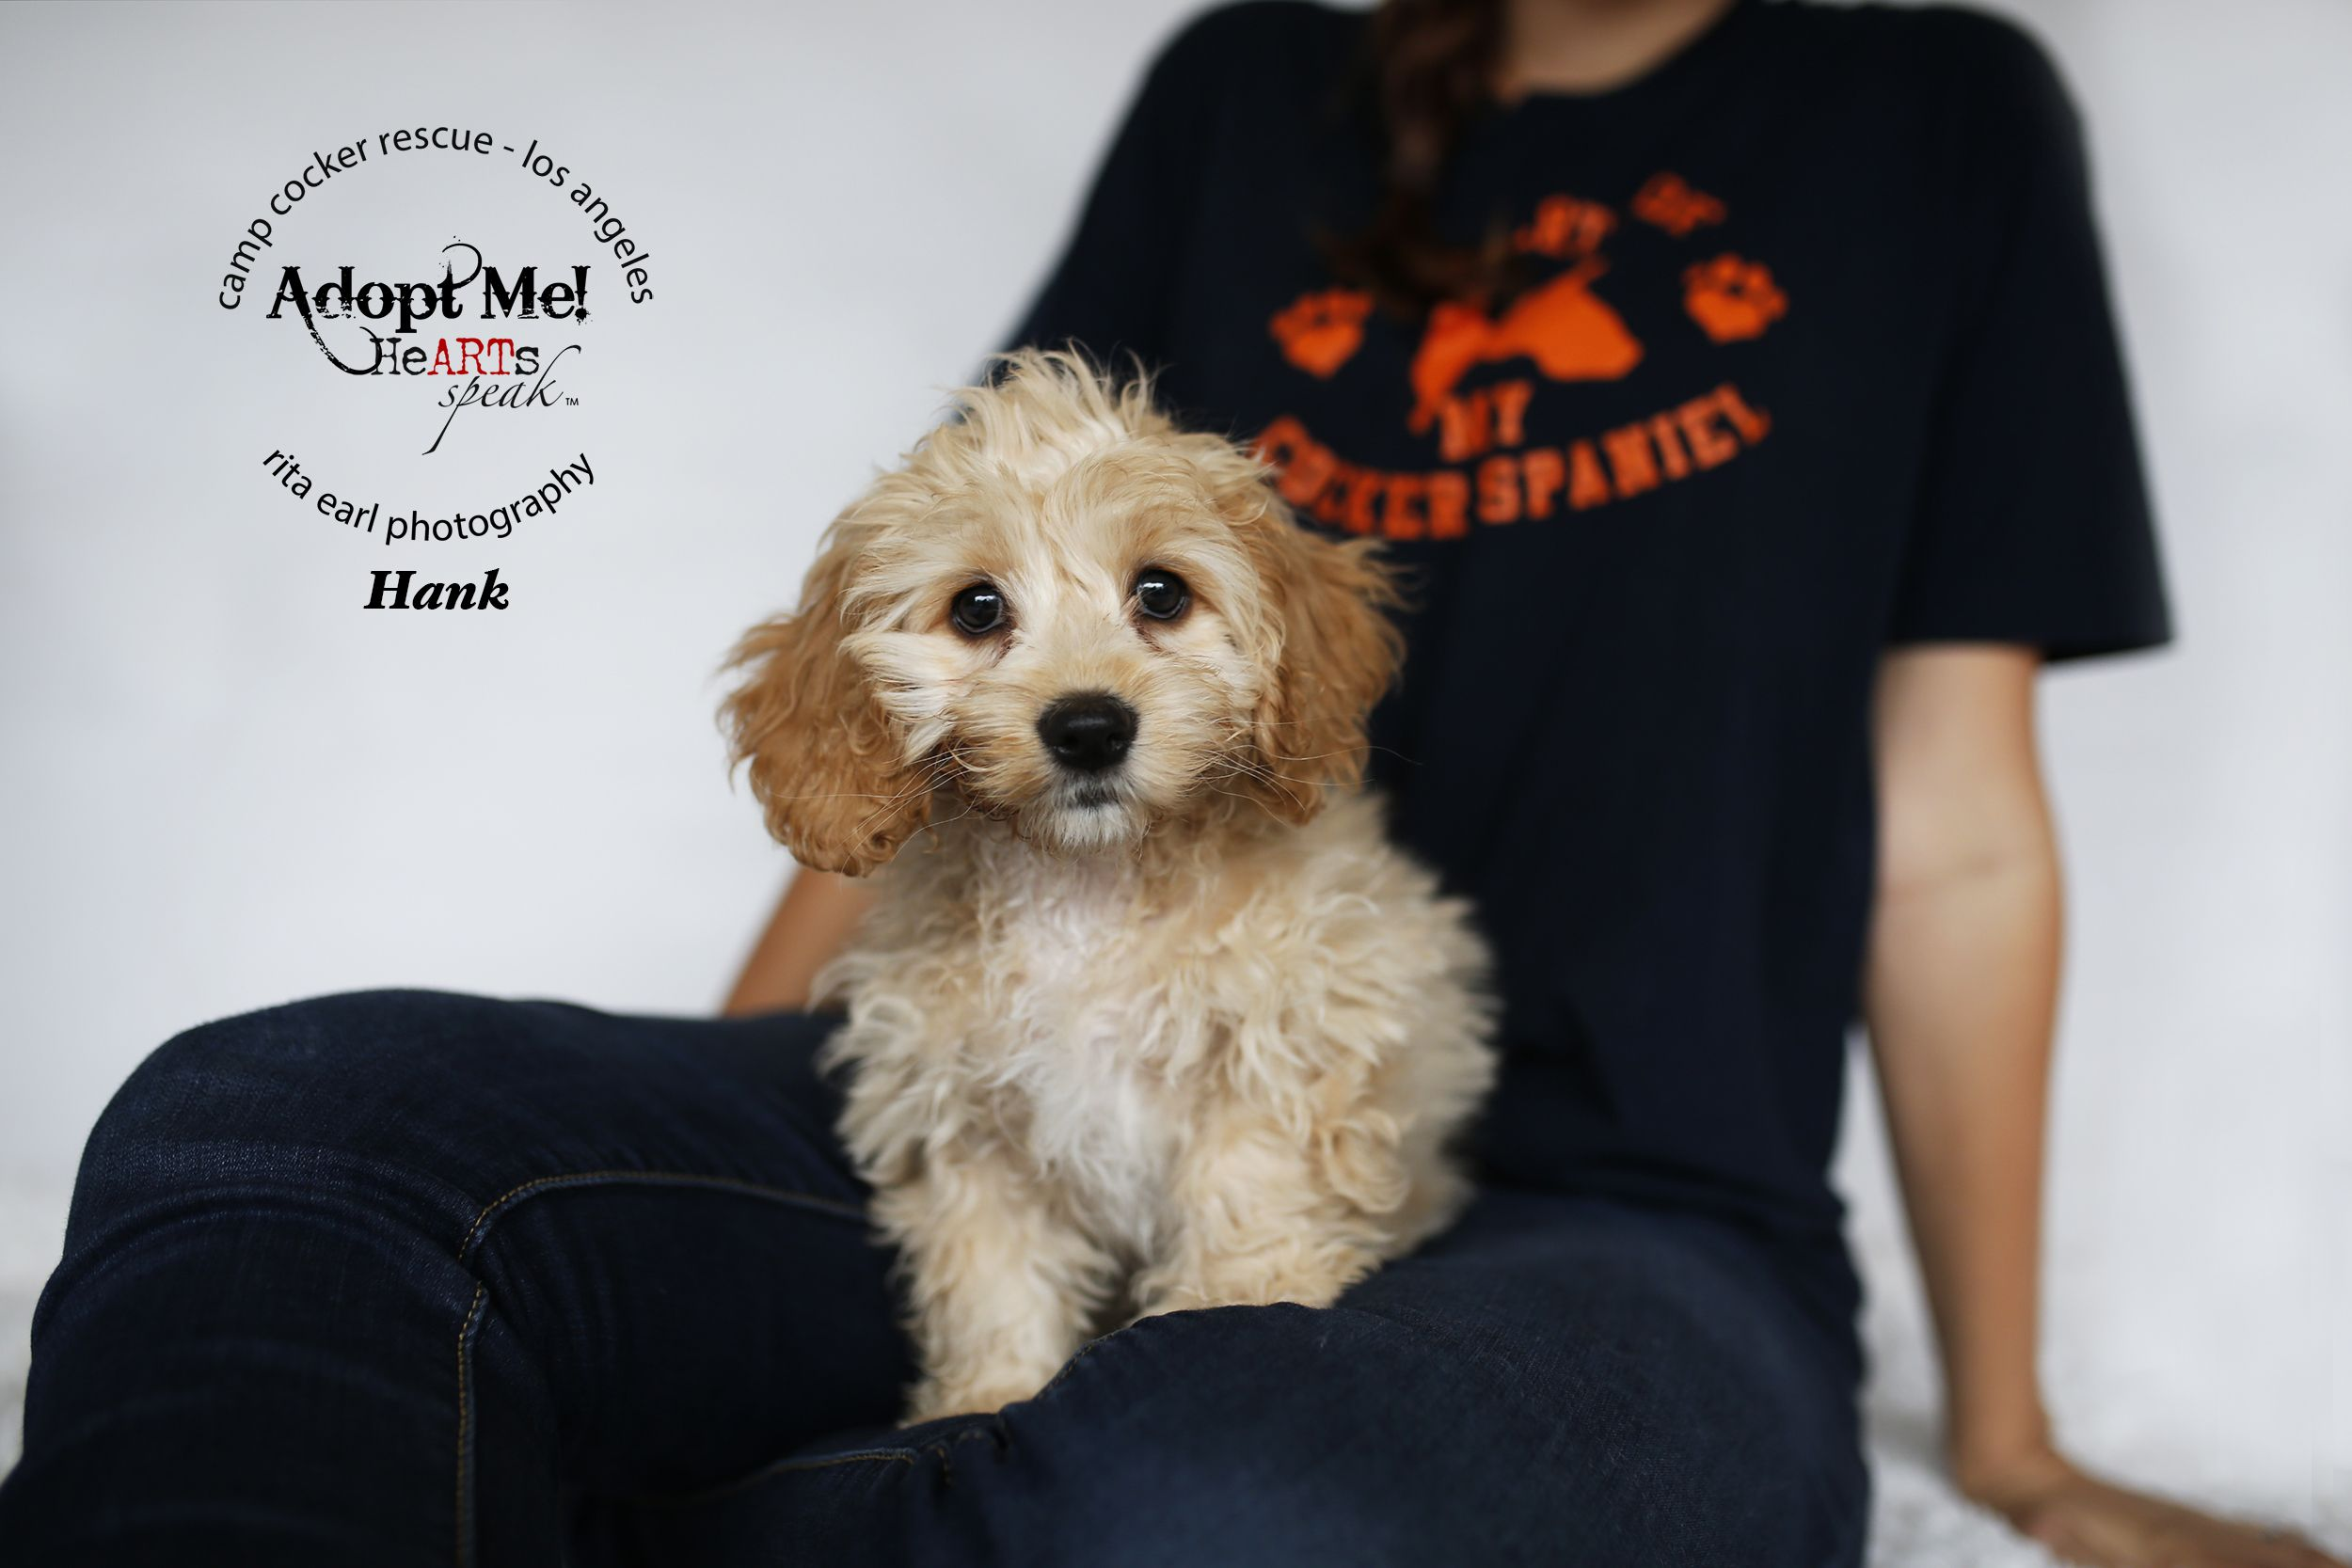 Cockapoo Dog For Adoption In Sherman Oaks Ca Adn 433700 On Puppyfinder Com Gender Male Age Baby Cockapoo Dog Cockapoo Dogs